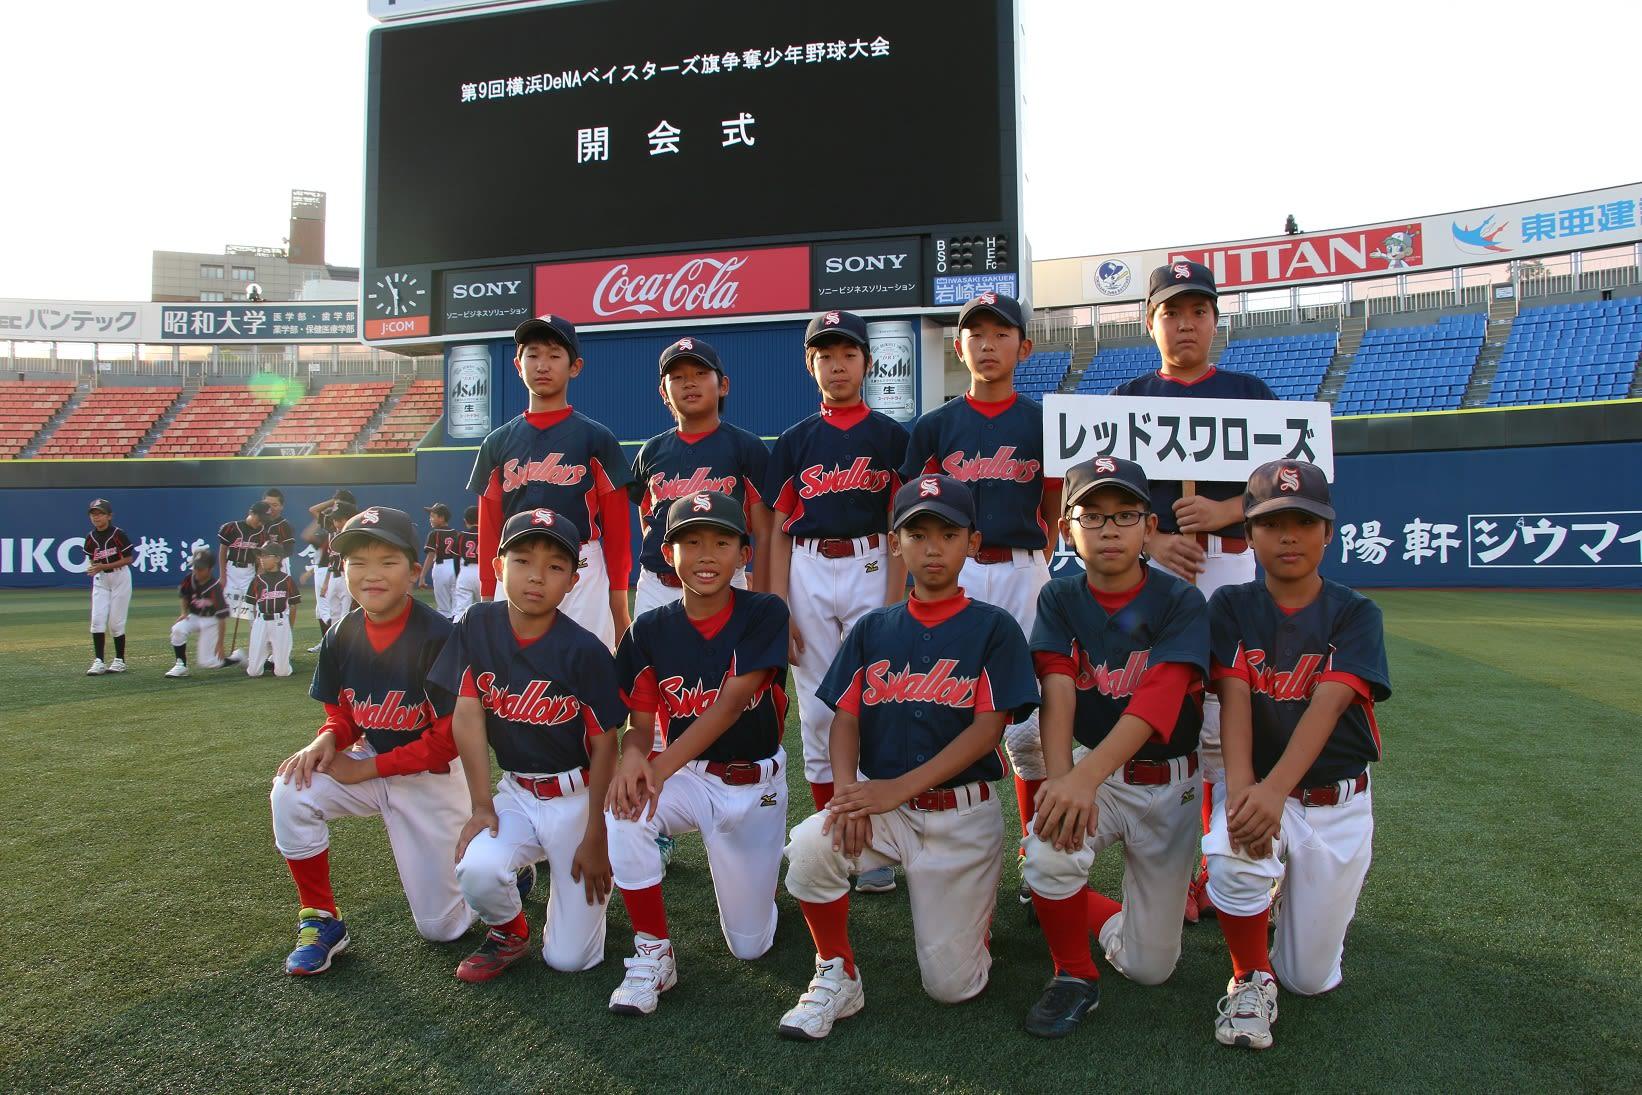 全日本都市対抗淡路島大会 参加54チーム! ベー …